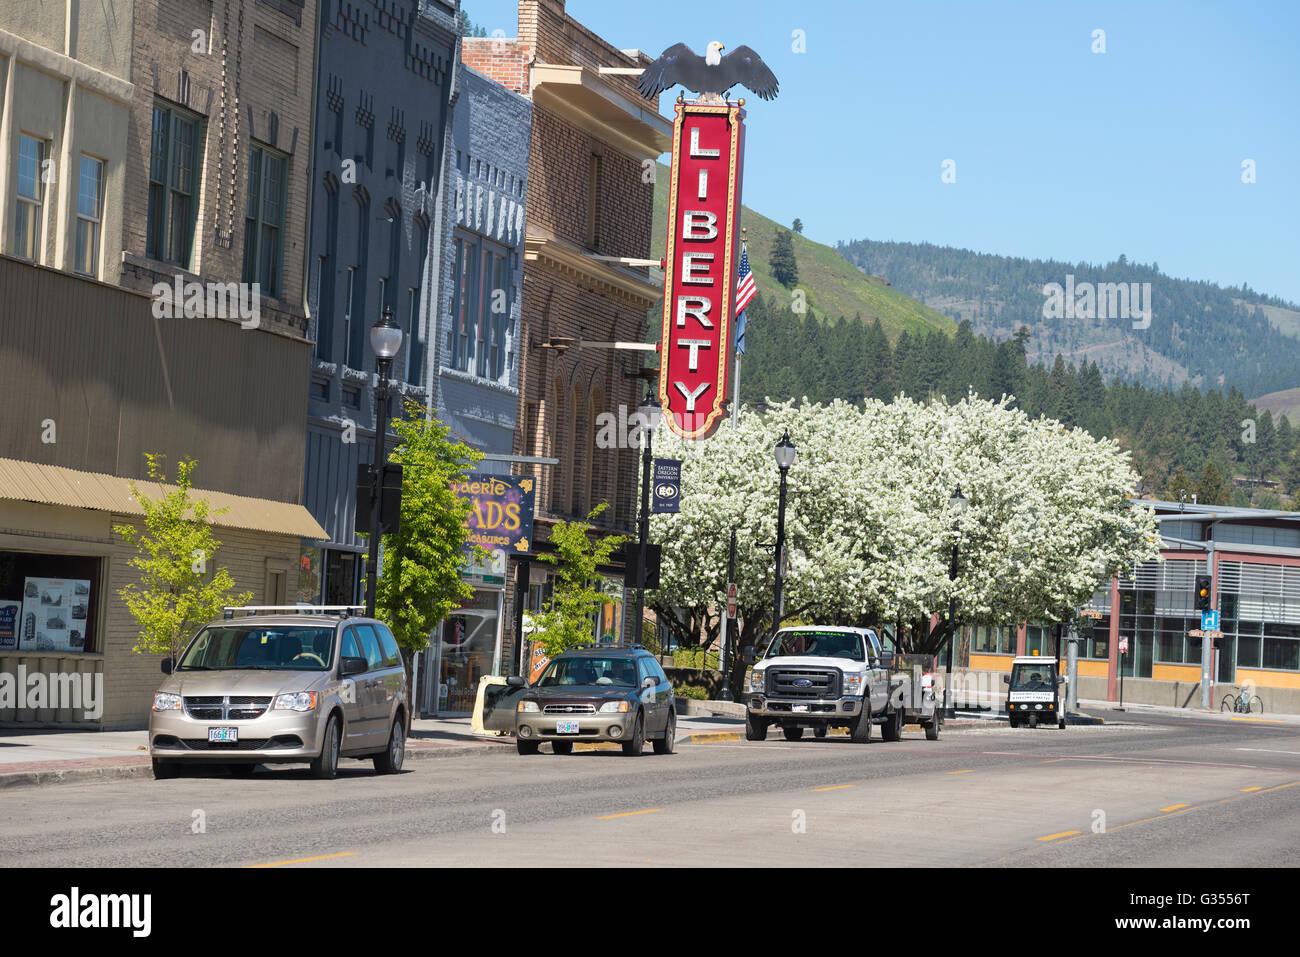 Downtown La Grande, Oregon. - Stock Image